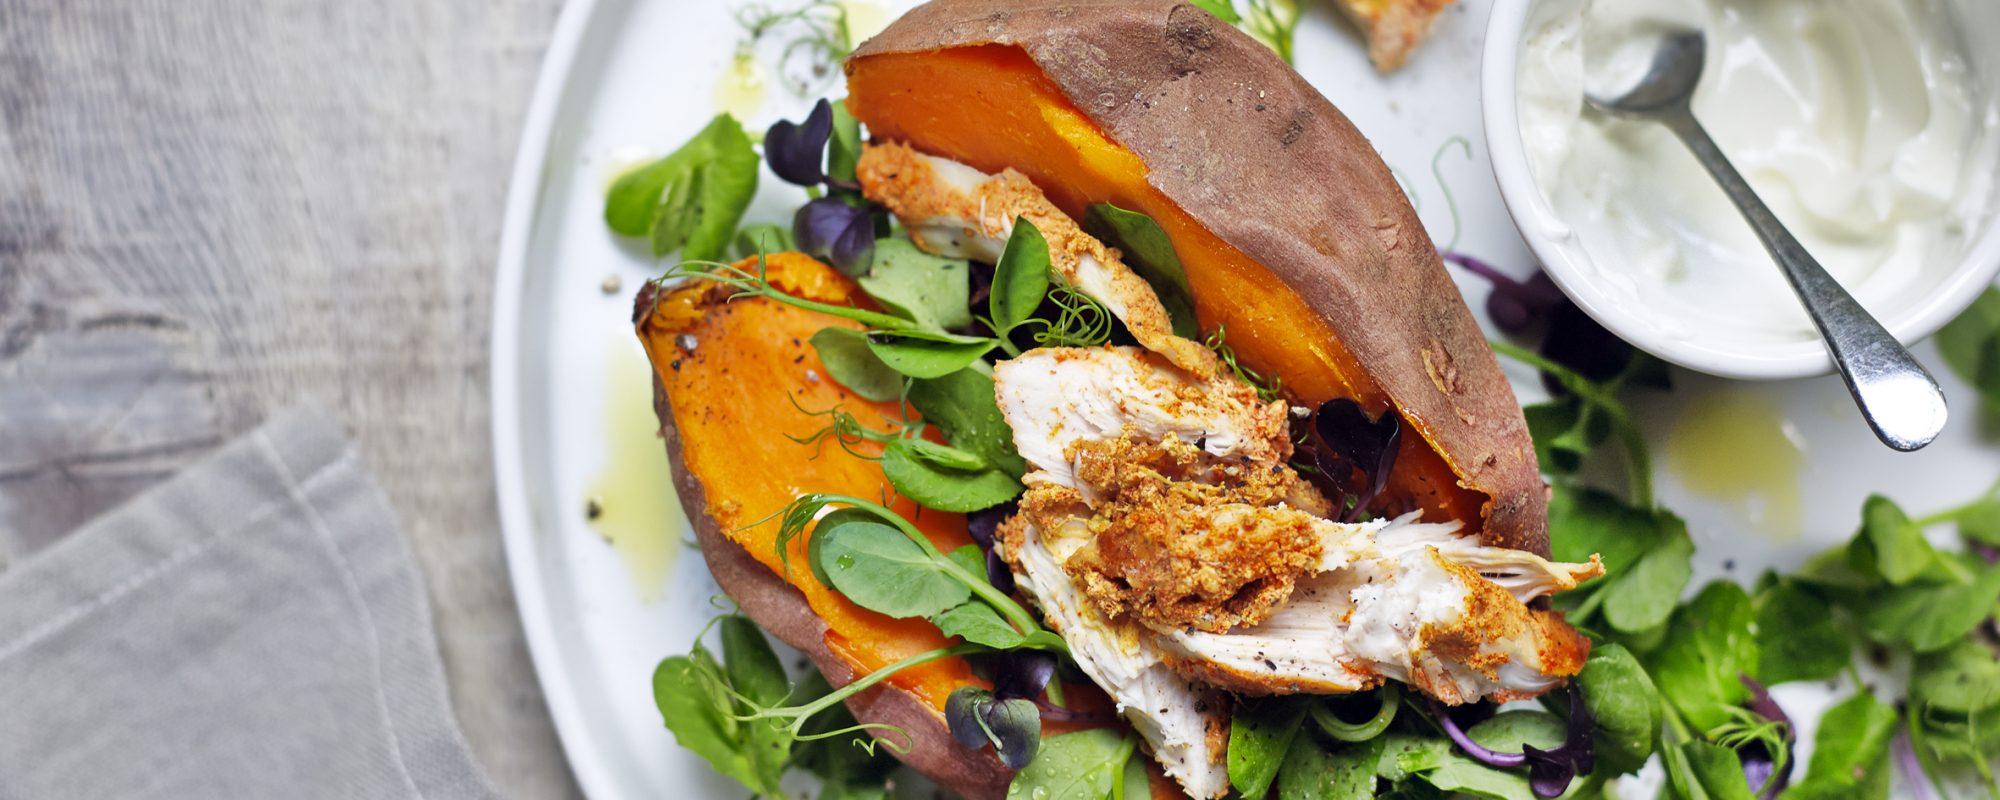 Sweet Potato, Tandoori Chicken & Pea Shoots